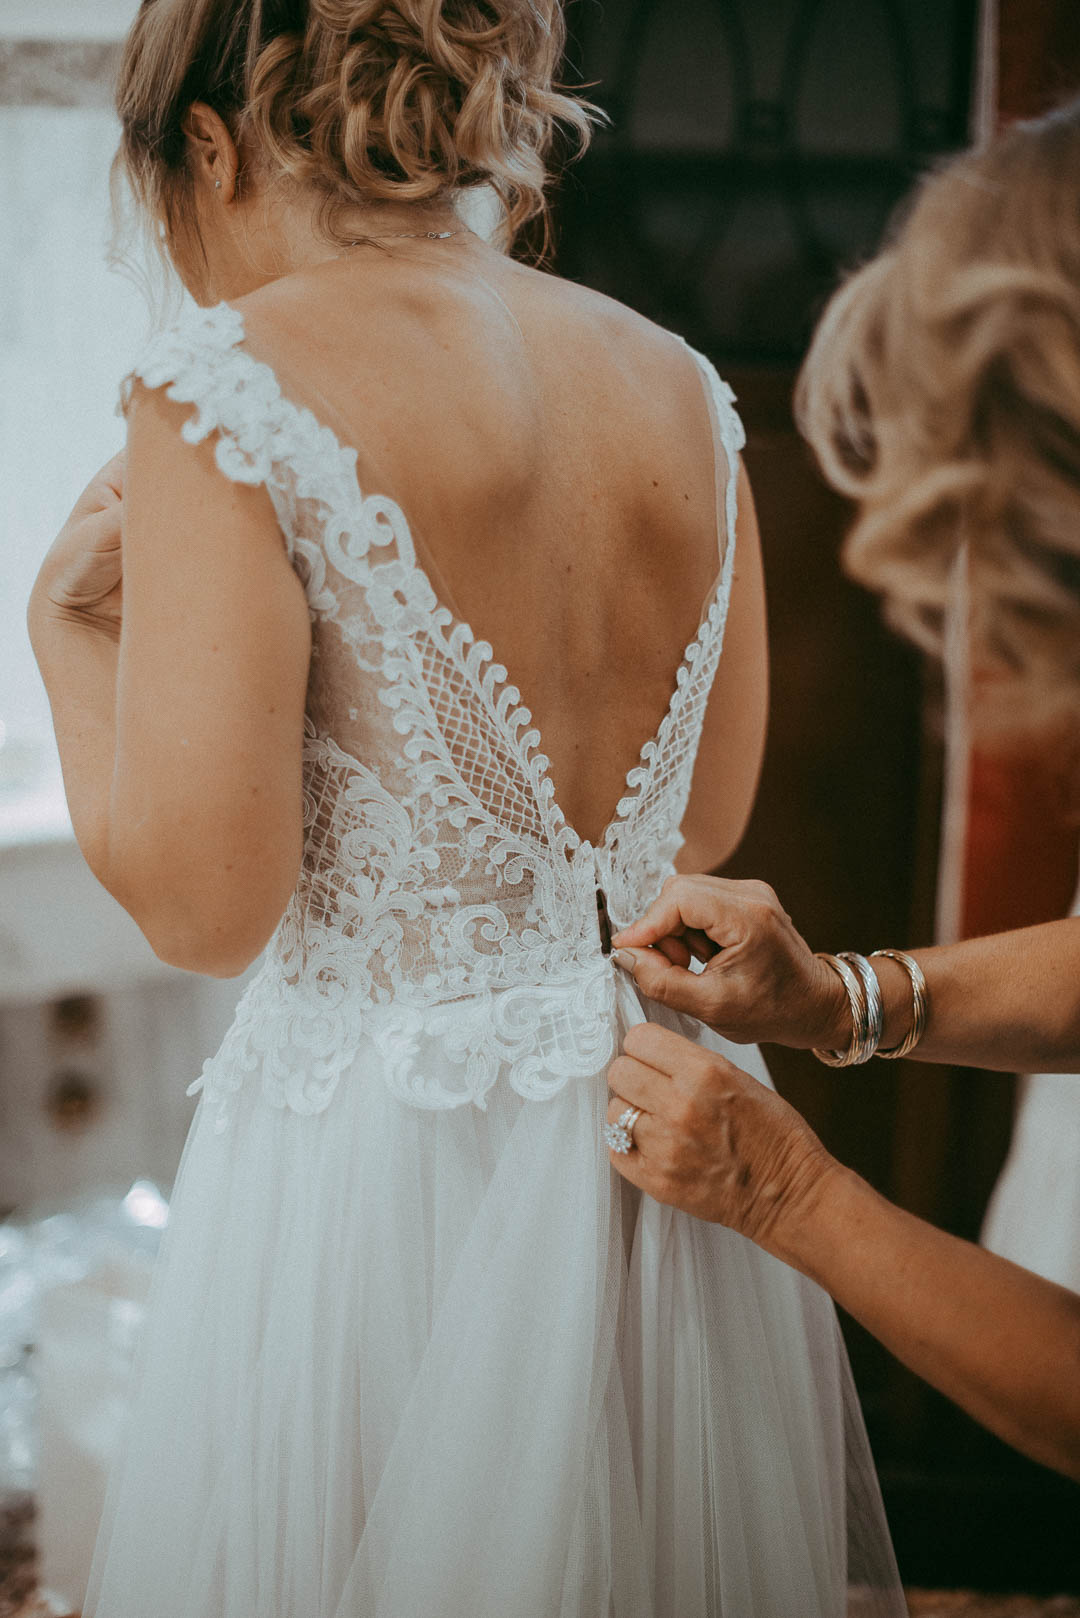 vivianeizzo-spazio46-wedding-photographer-destination-reportage-napoli-villacilento-25